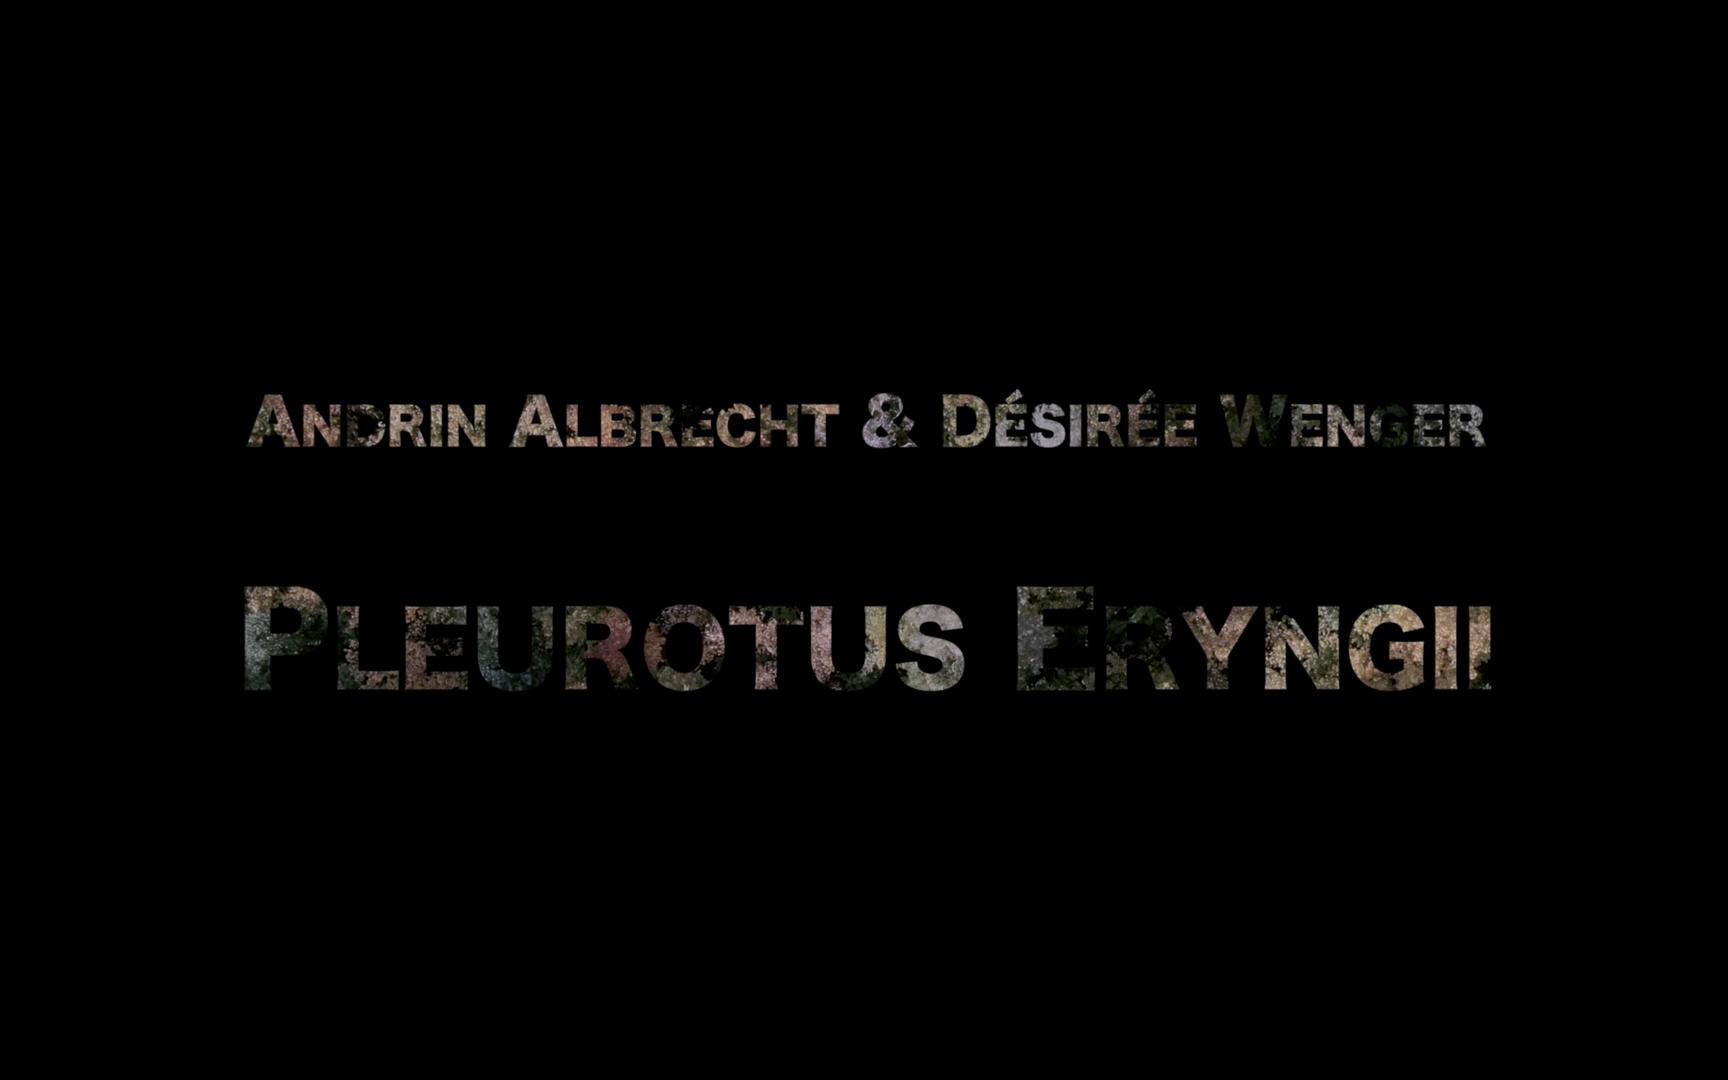 Pleurotus Eryngii